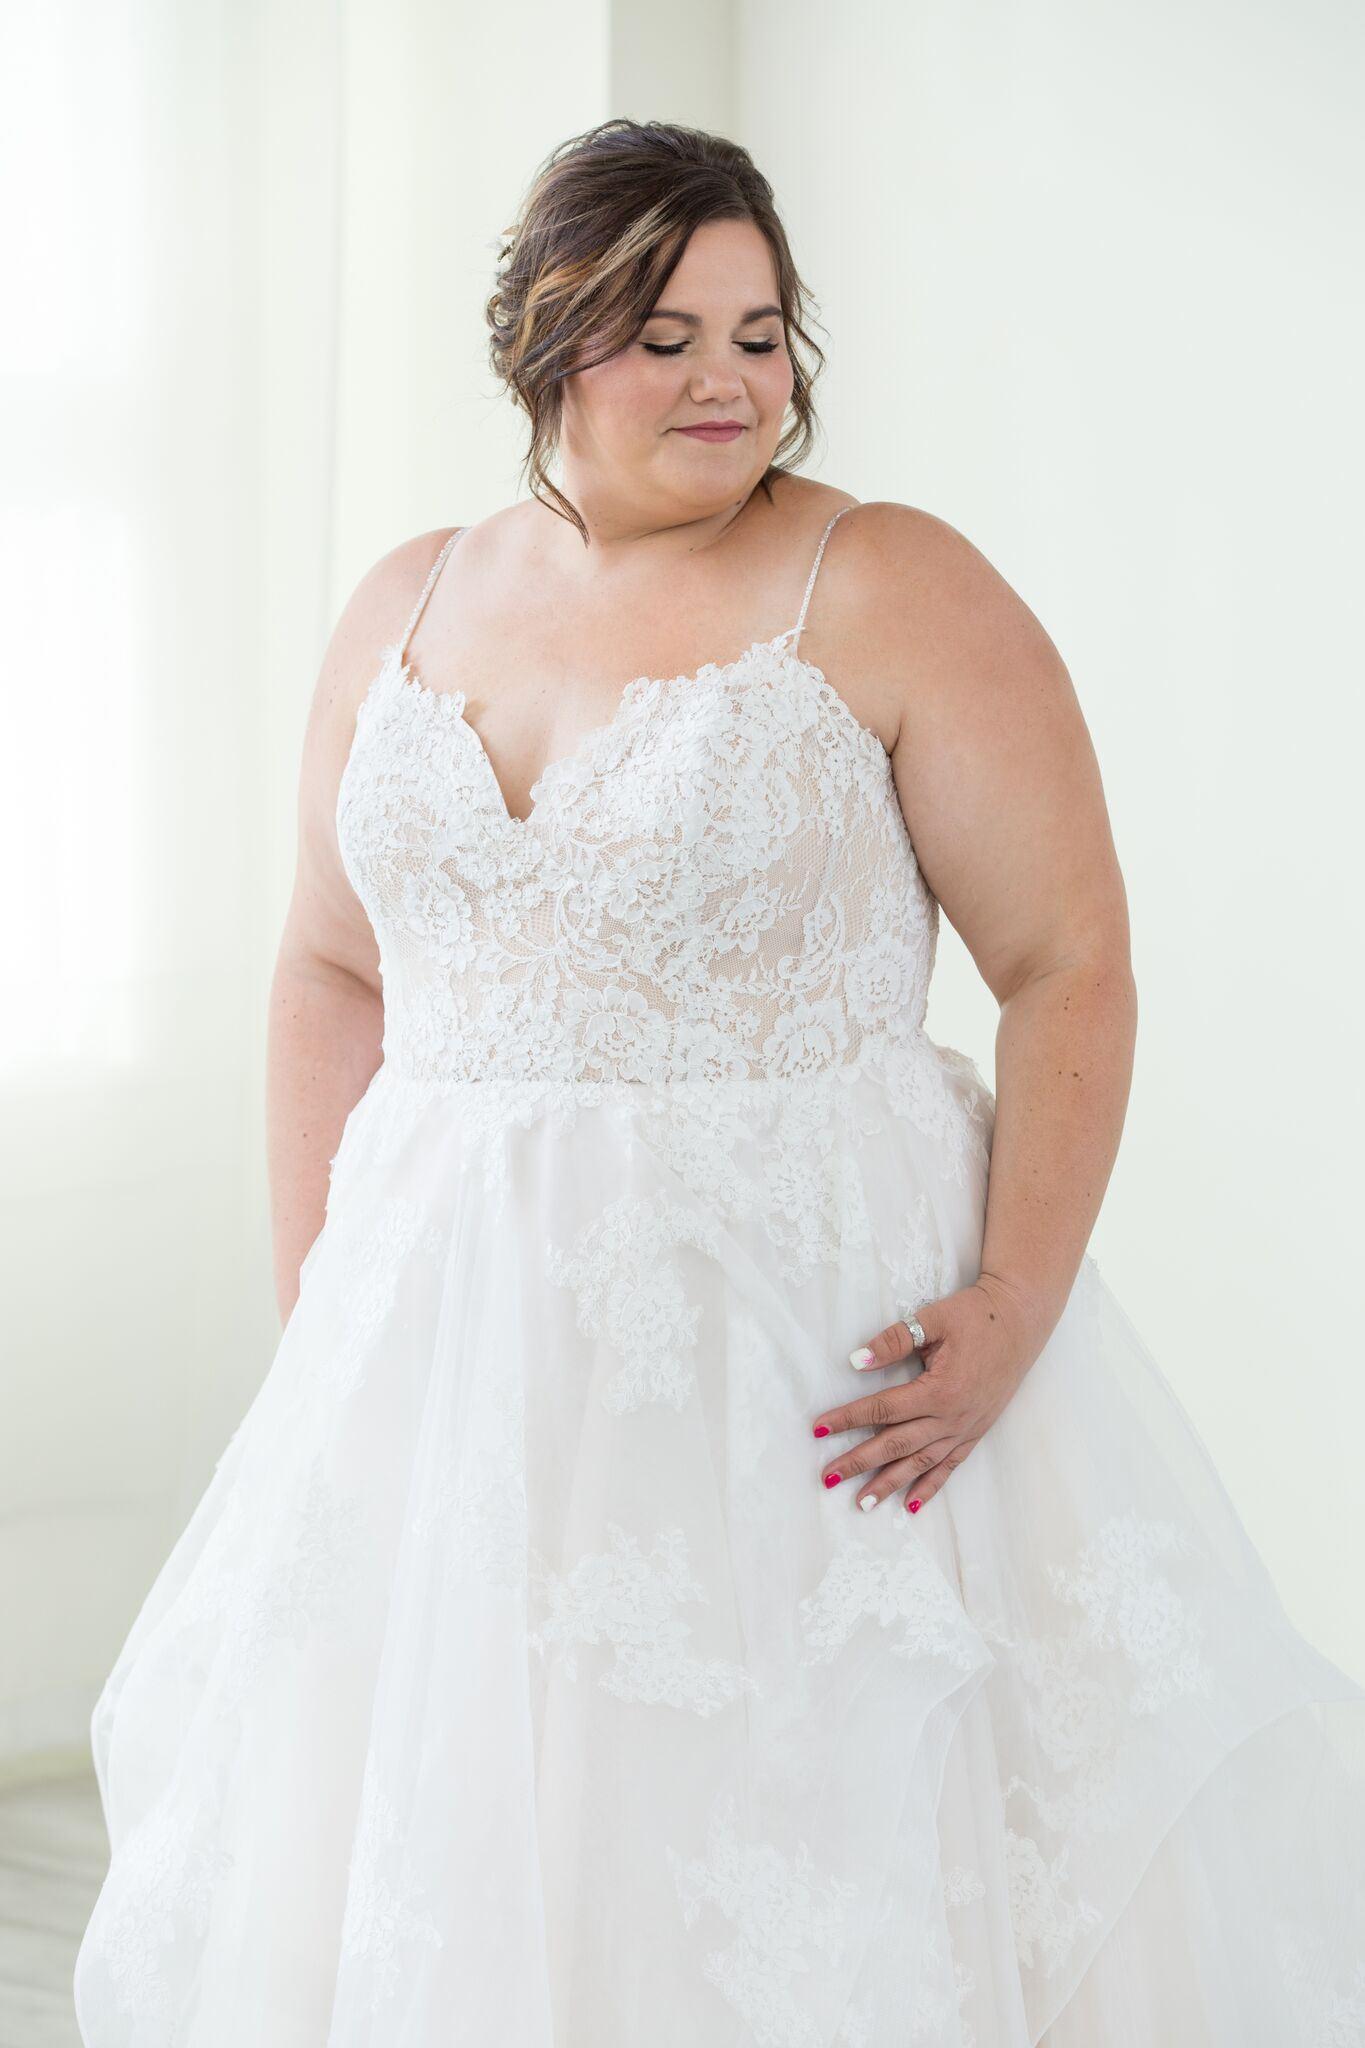 435987eb2135 Charlotte's Weddings and more, Portland Wedding gowns, wedding dresses,  Justin Alexander Wedding Gowns, Bridal store, Bridesmaids dresses,Portland  ...